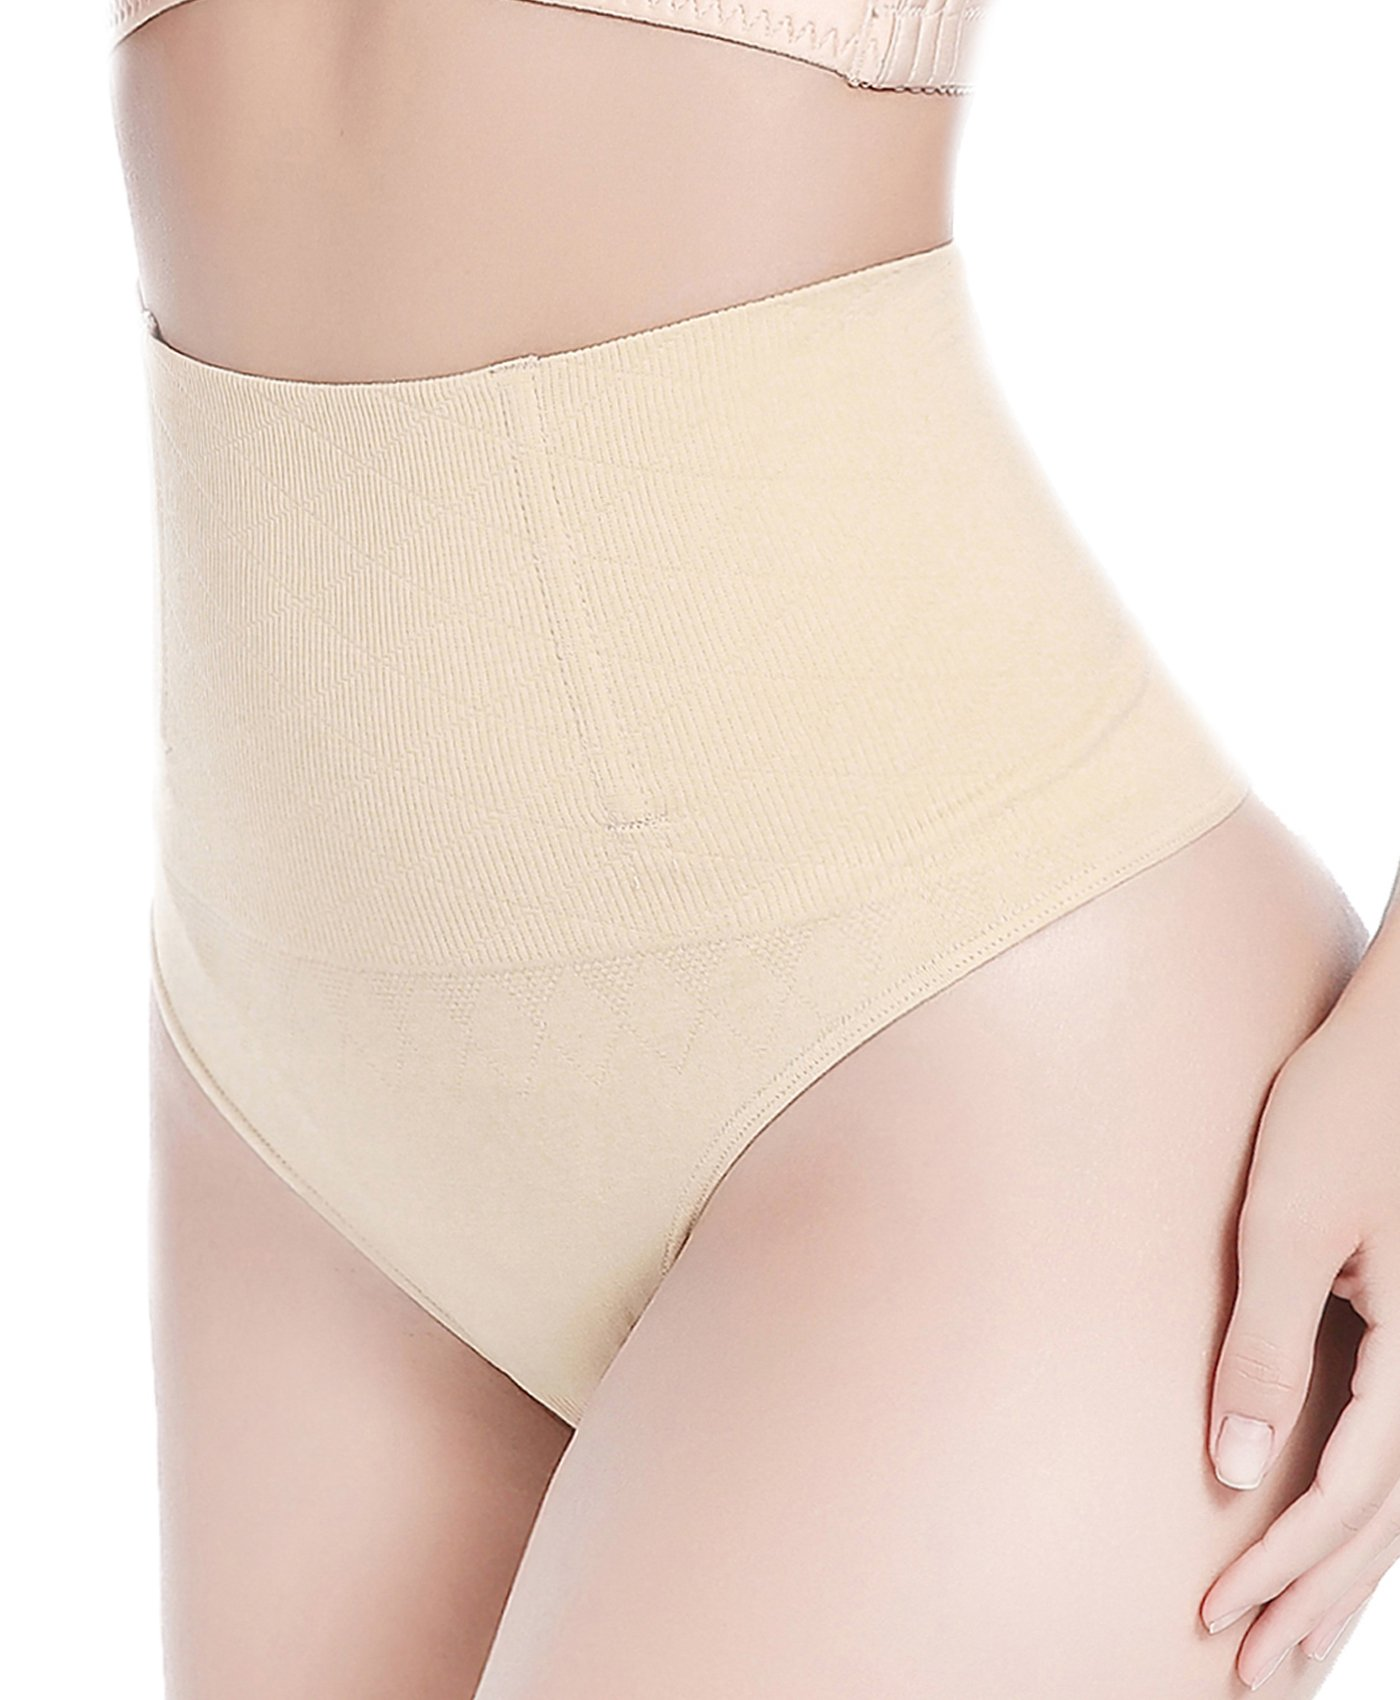 36466e35c6d4d 3-5 Days Delivery Women High Waist Trainer Tummy Slimming Control Waist  Cincher Shapewear Body